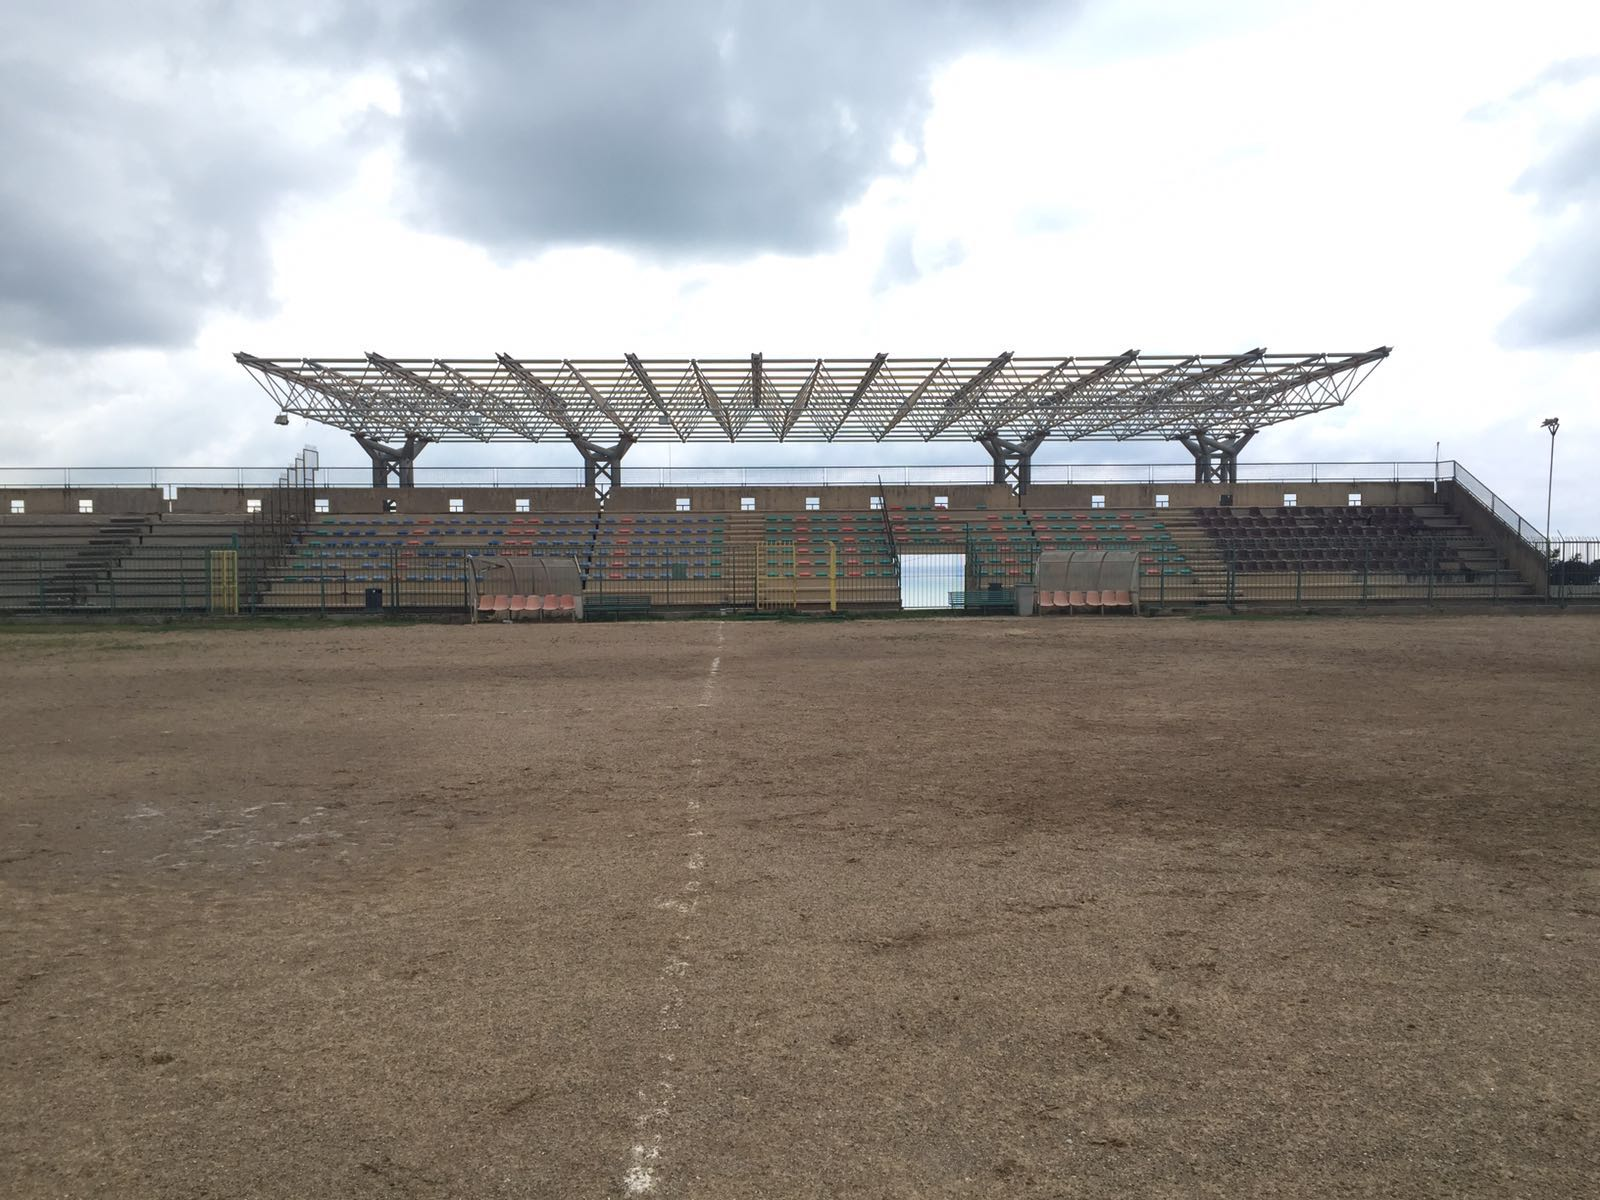 Grana stadio Cephaledium, niente nulla osta per il Santa Barbara